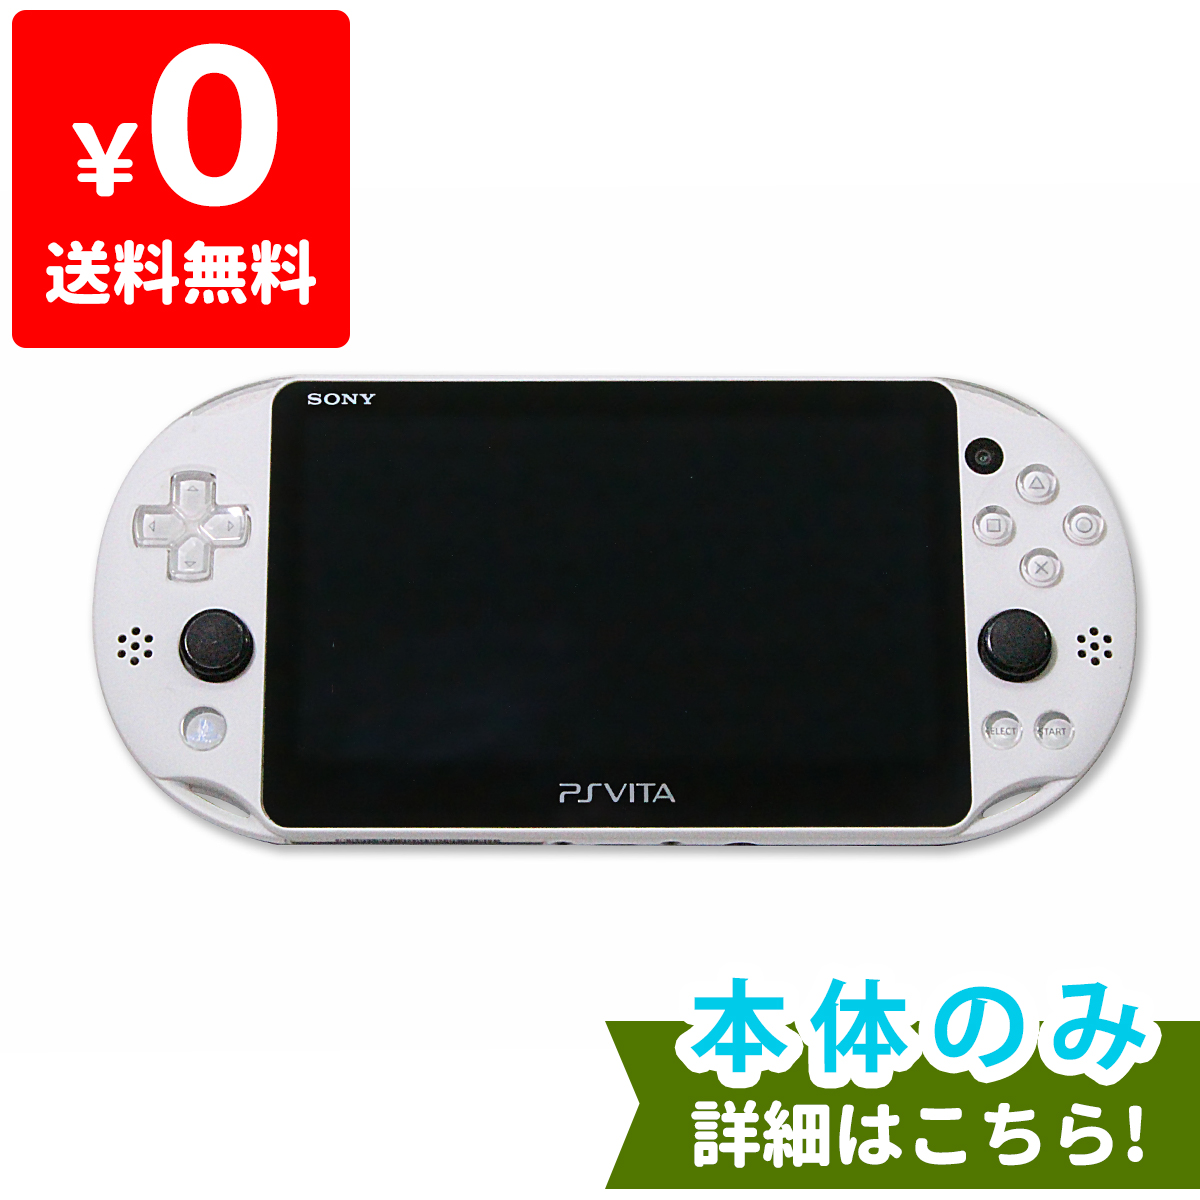 PSVita 2000 PlayStation Vita Wi-Fiモデル グレイシャー・ホワイト(PCH-2000ZA22) 本体のみ PlayStationVita SONY ソニー 中古 4948872414067 送料無料 【中古】